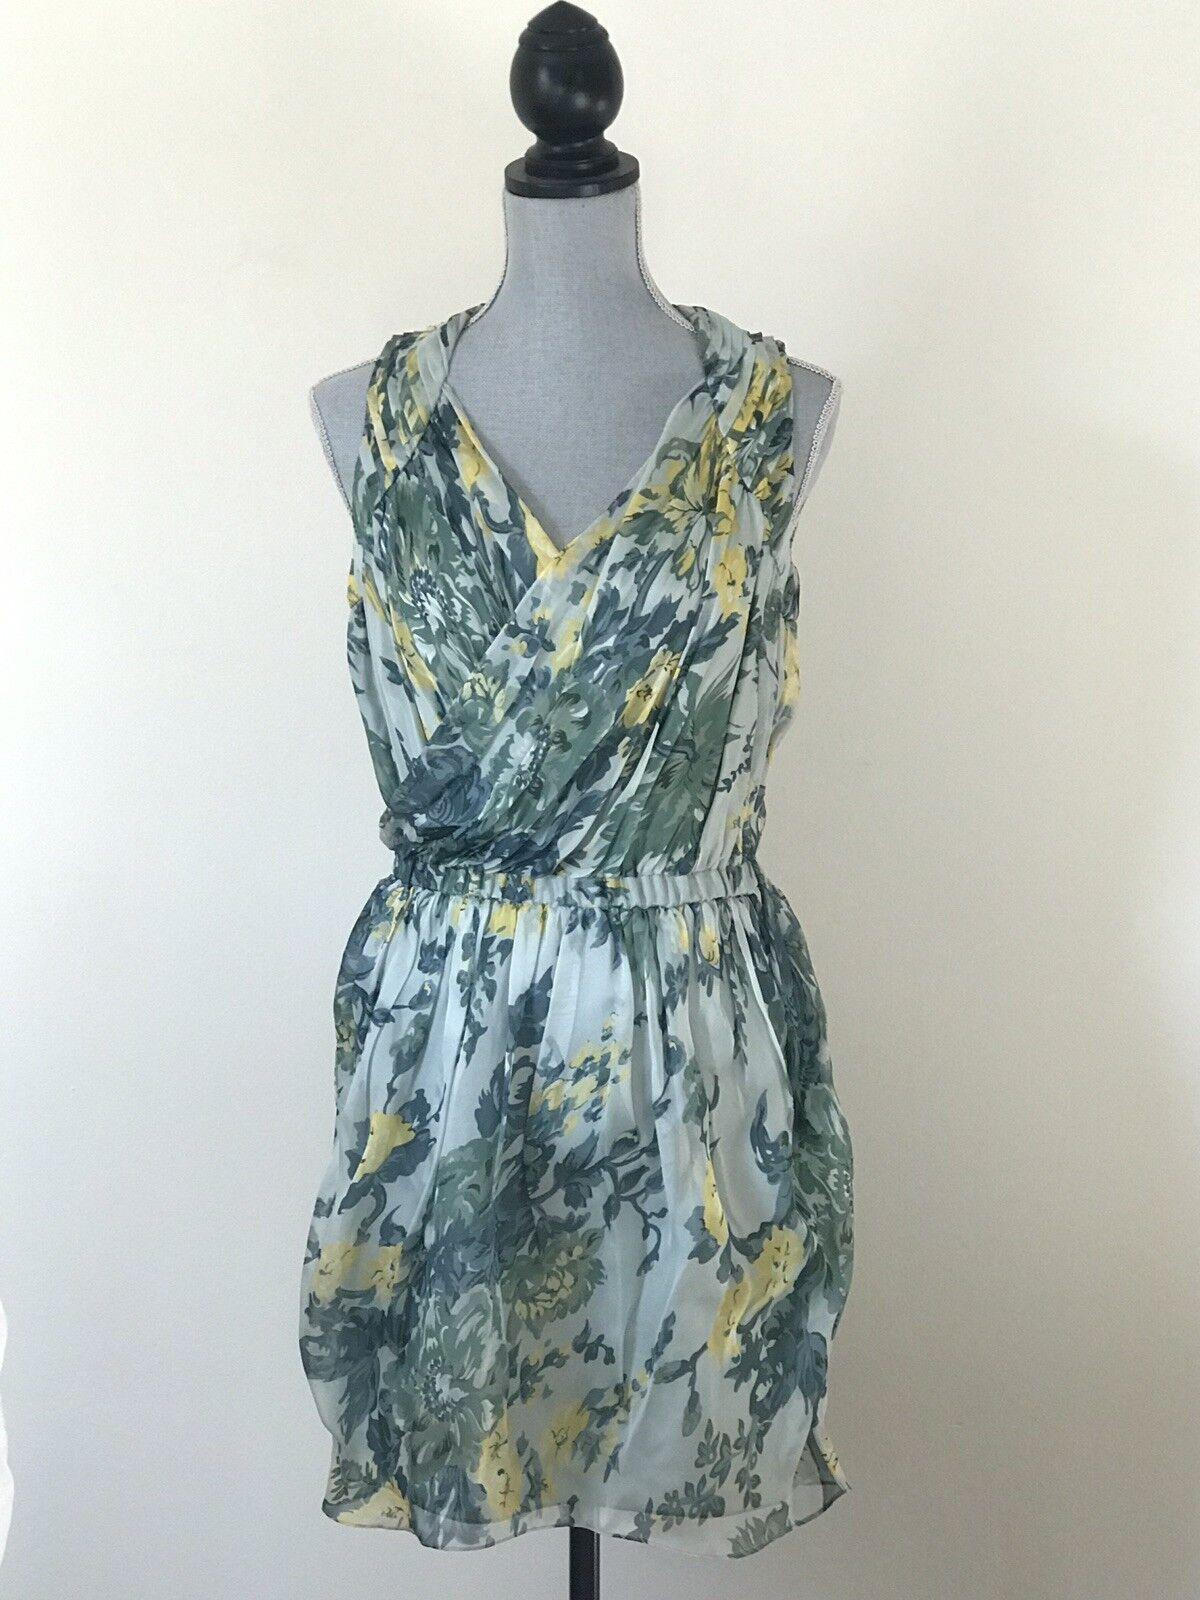 Elizabeth and james james james Floral Silk Dress Medium 99a451